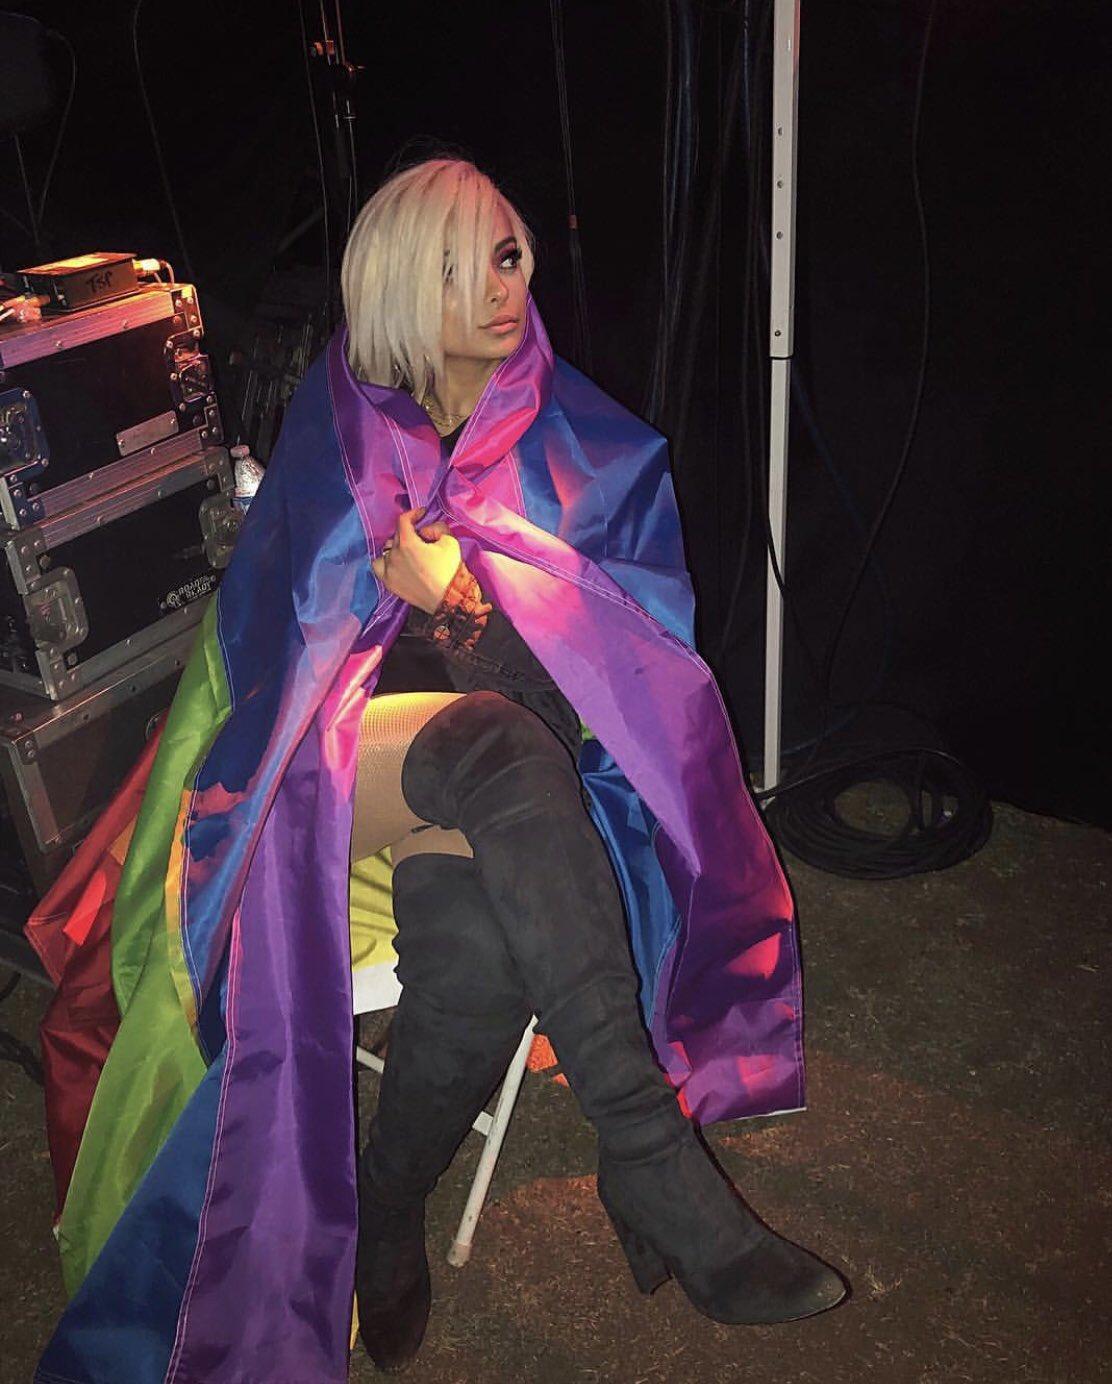 Me all Pride month. ��❤️����♀️ https://t.co/AfR01dTSiP